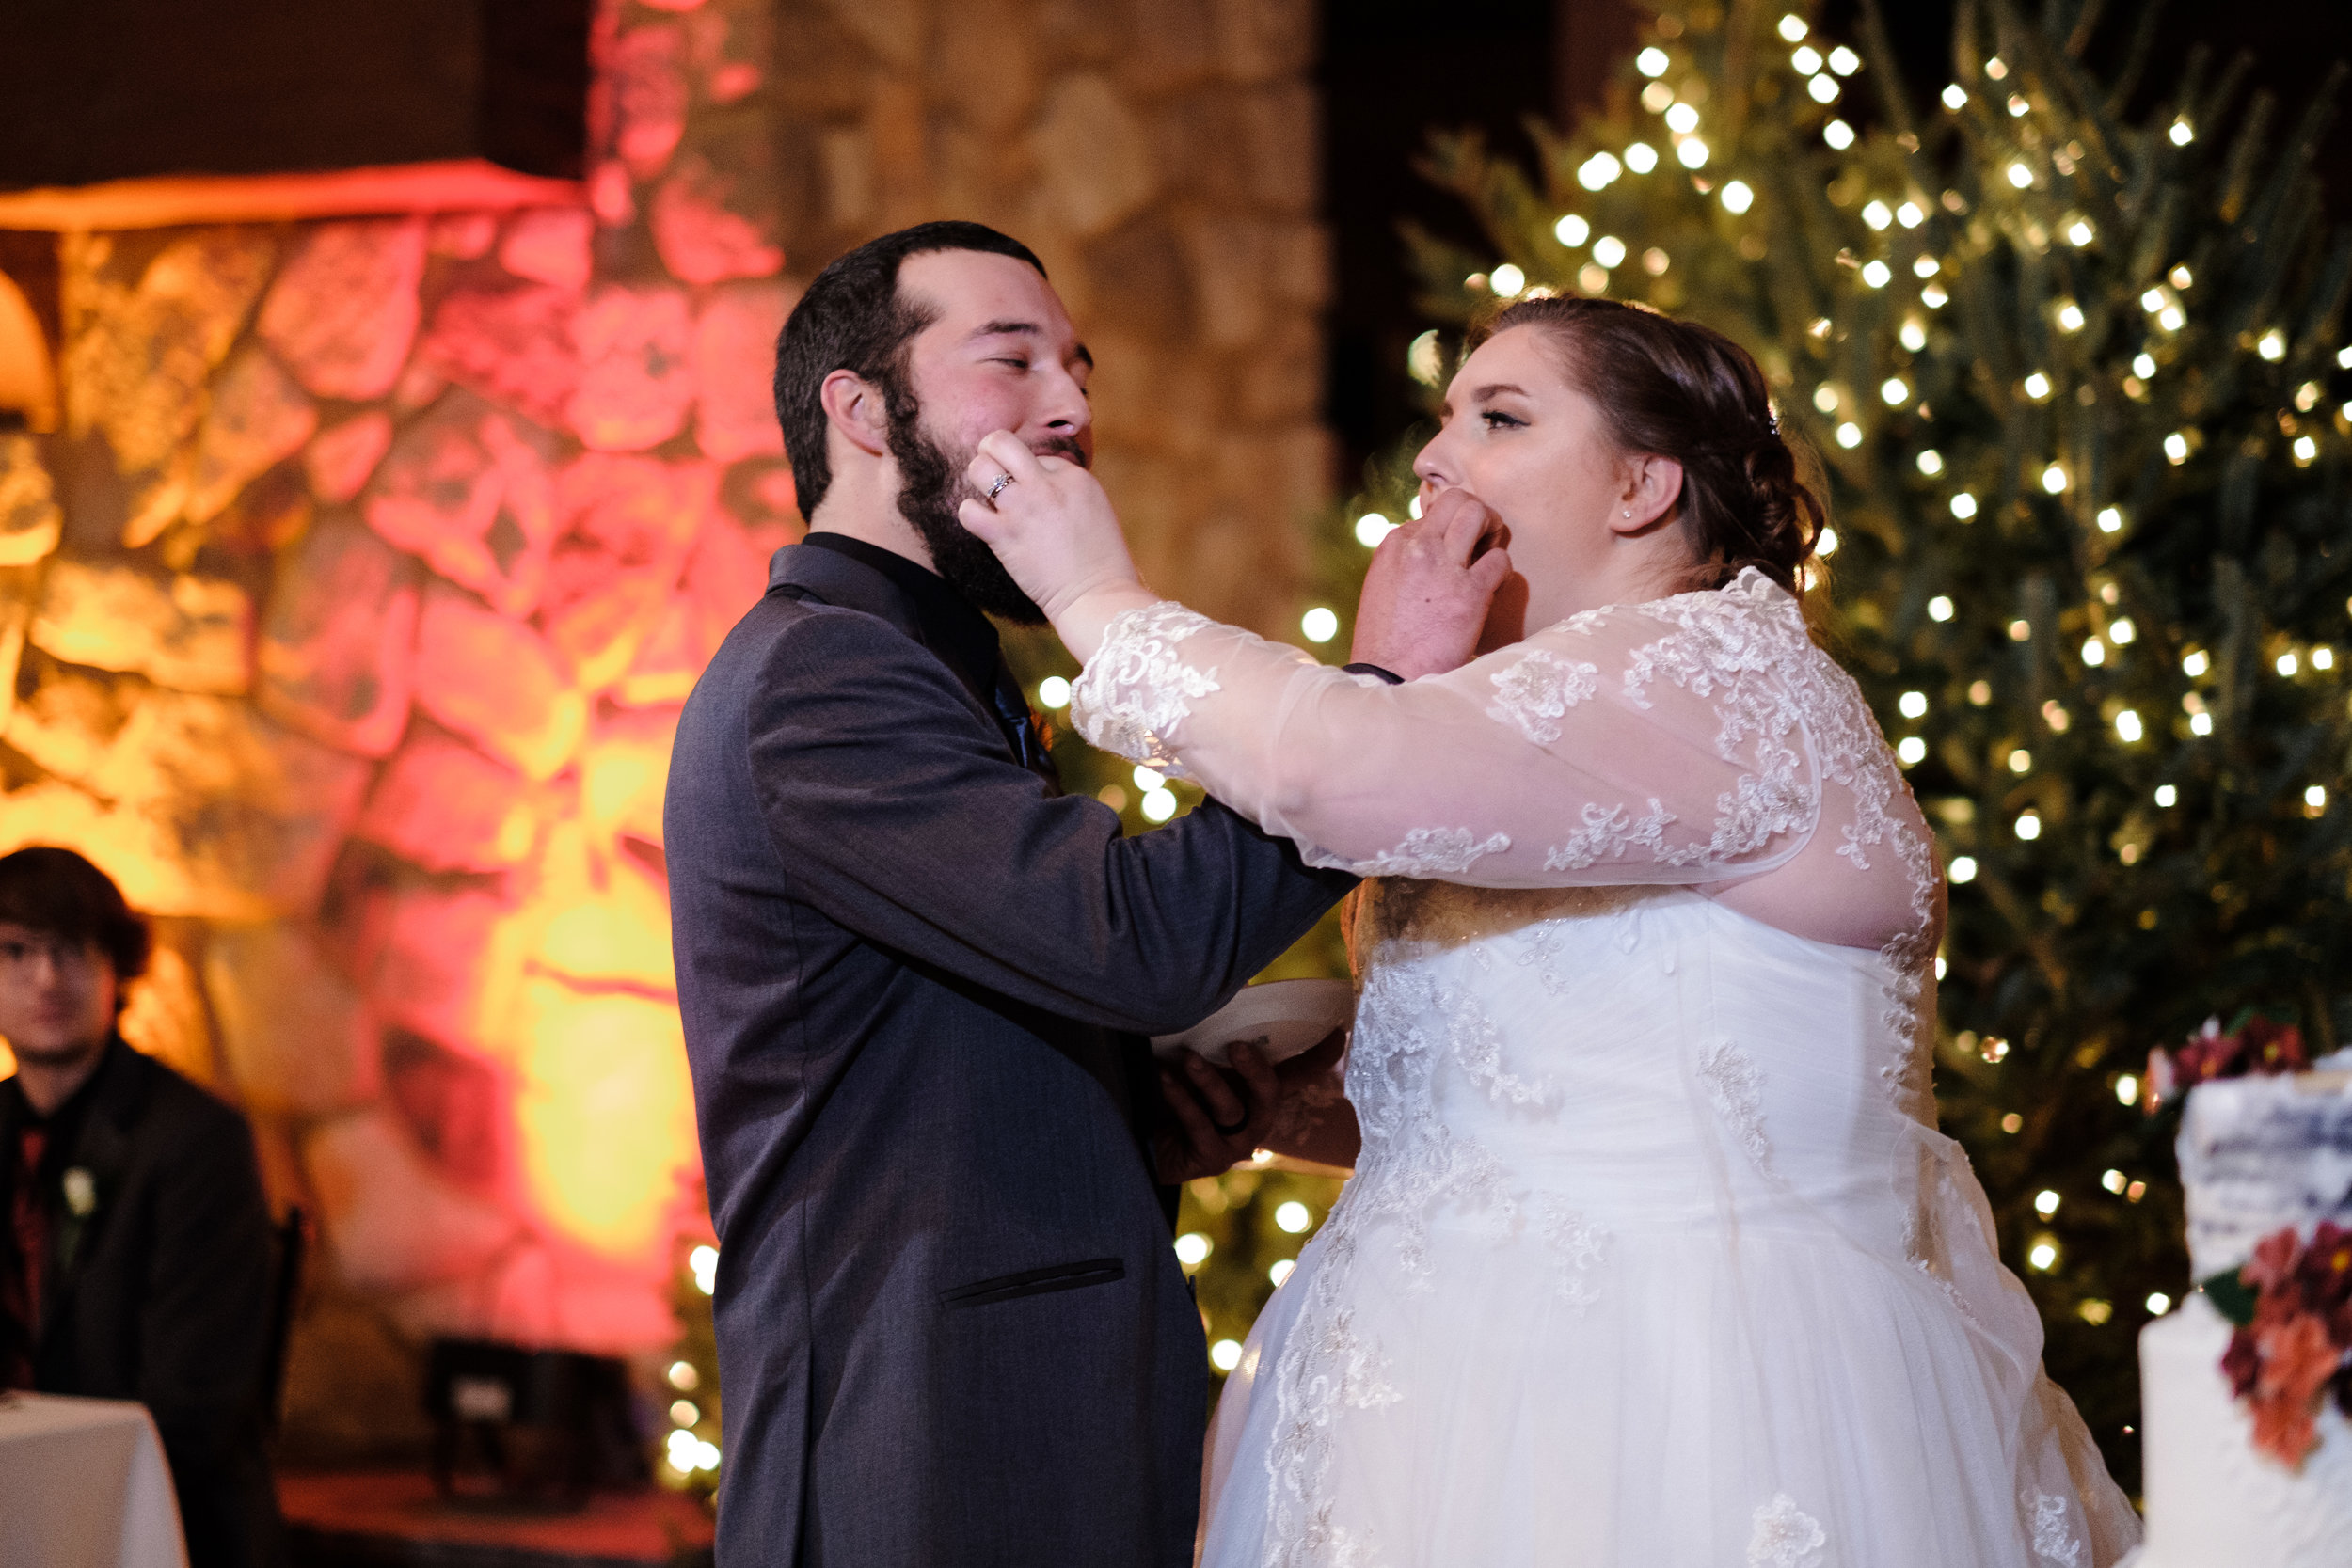 18-12-28 Corinne-Henry-Pavilion-Wedding-458.jpg